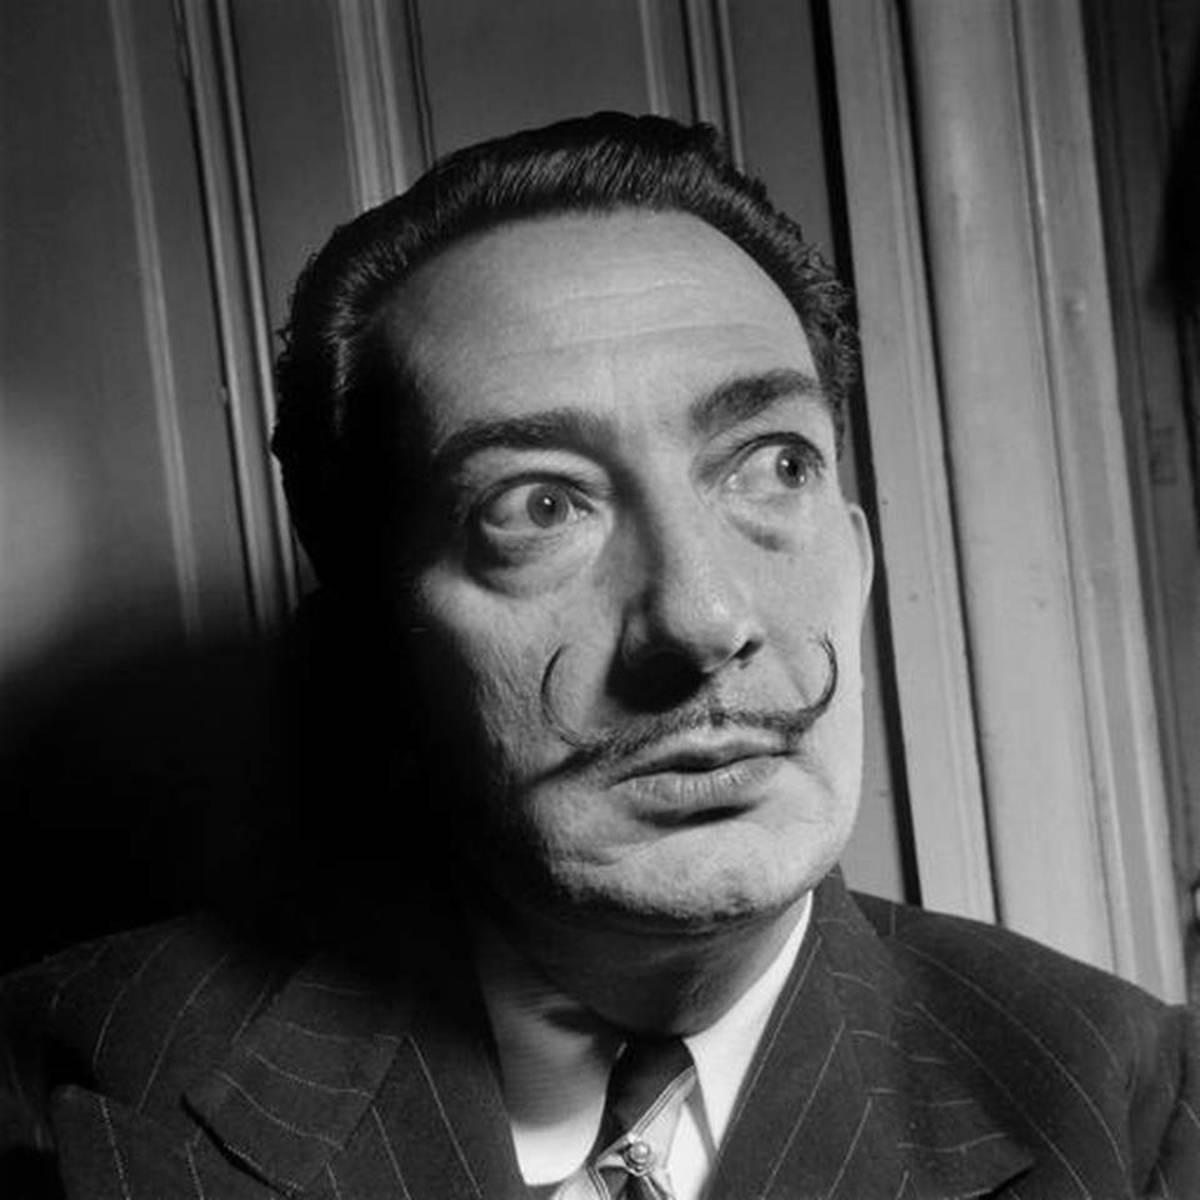 Photo taken in the 50s shows Spanish artist Salvador Dali.